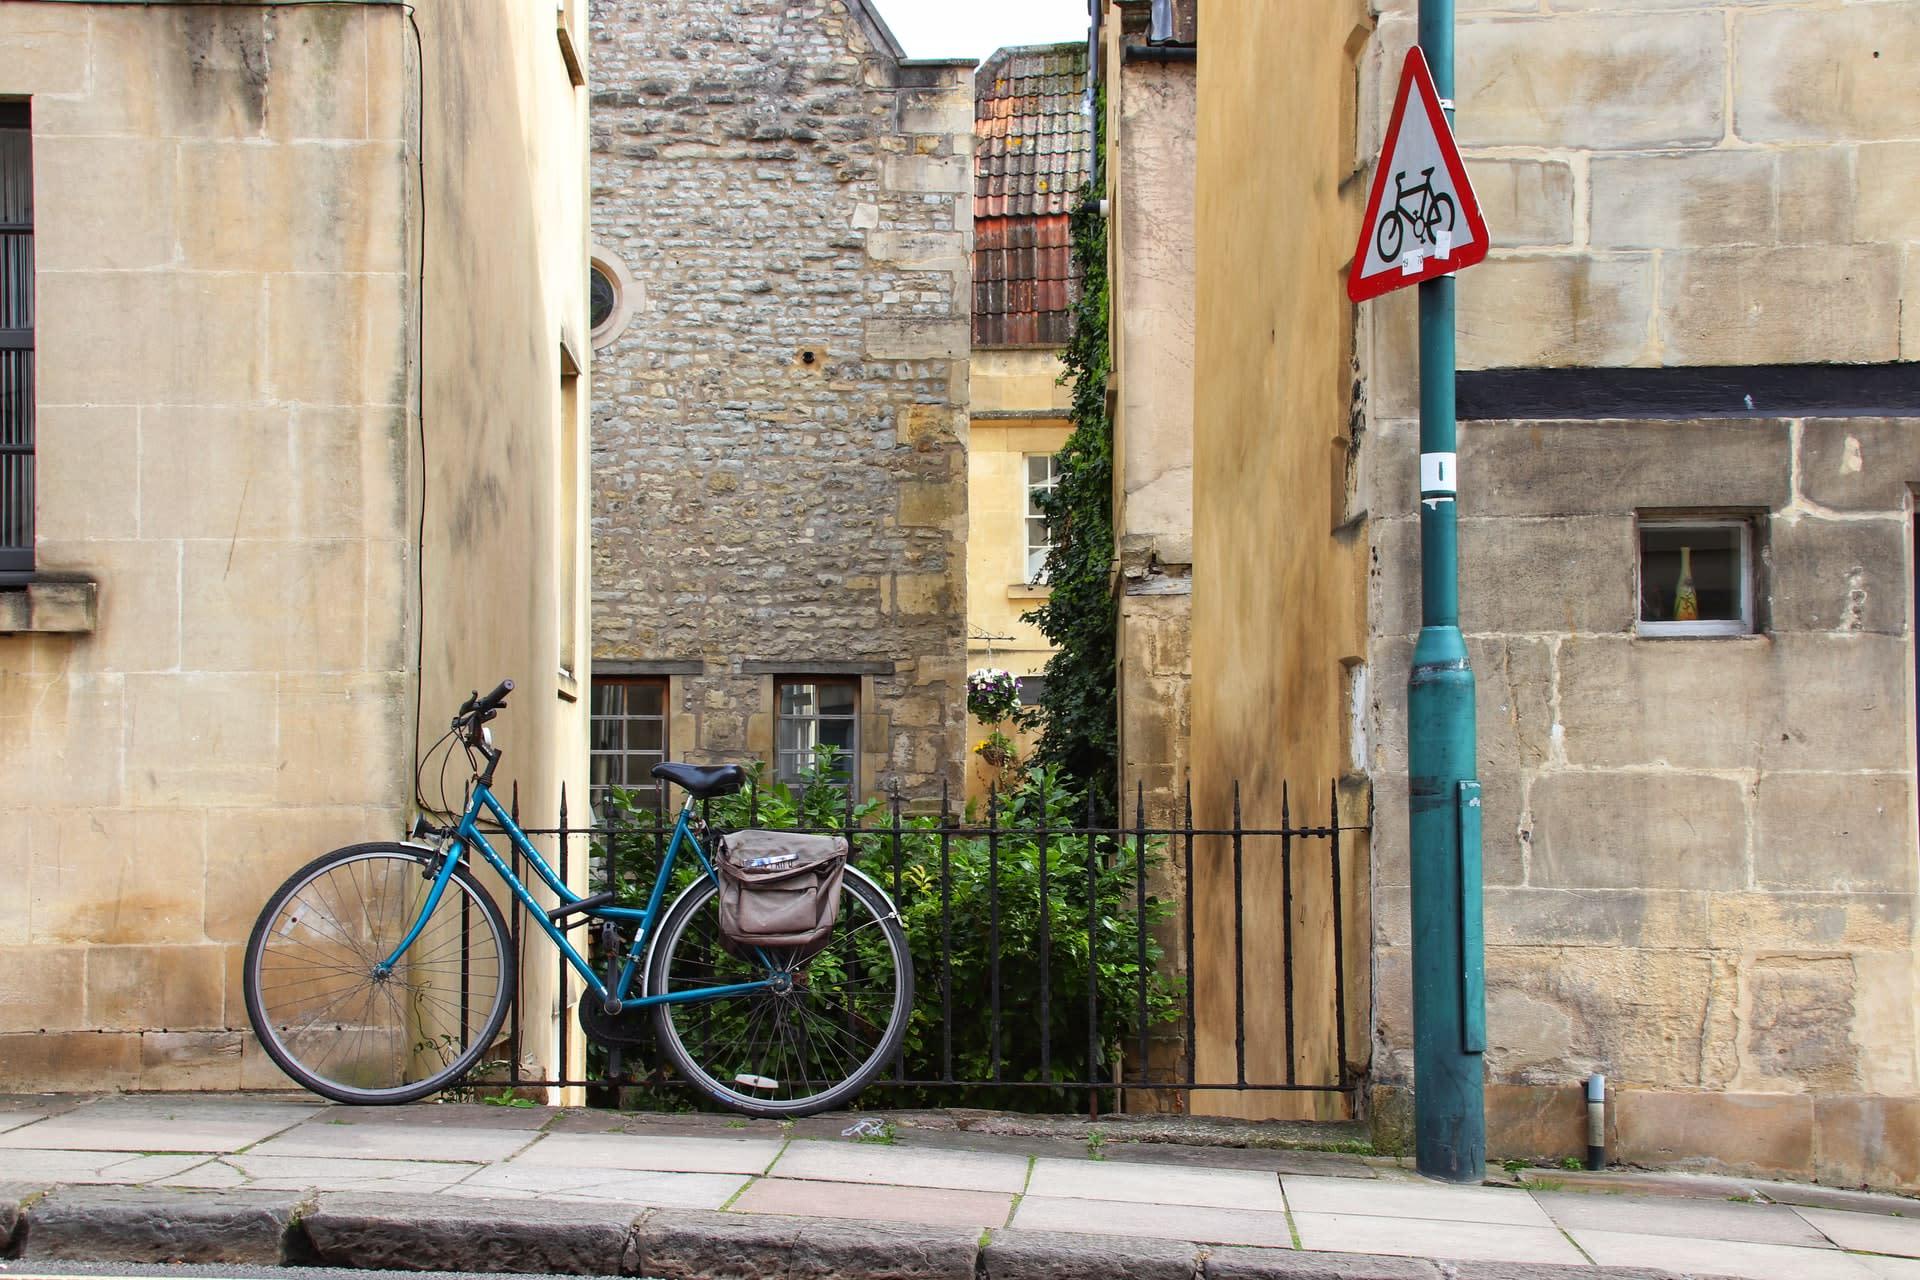 Bike parked on pavement in Bath